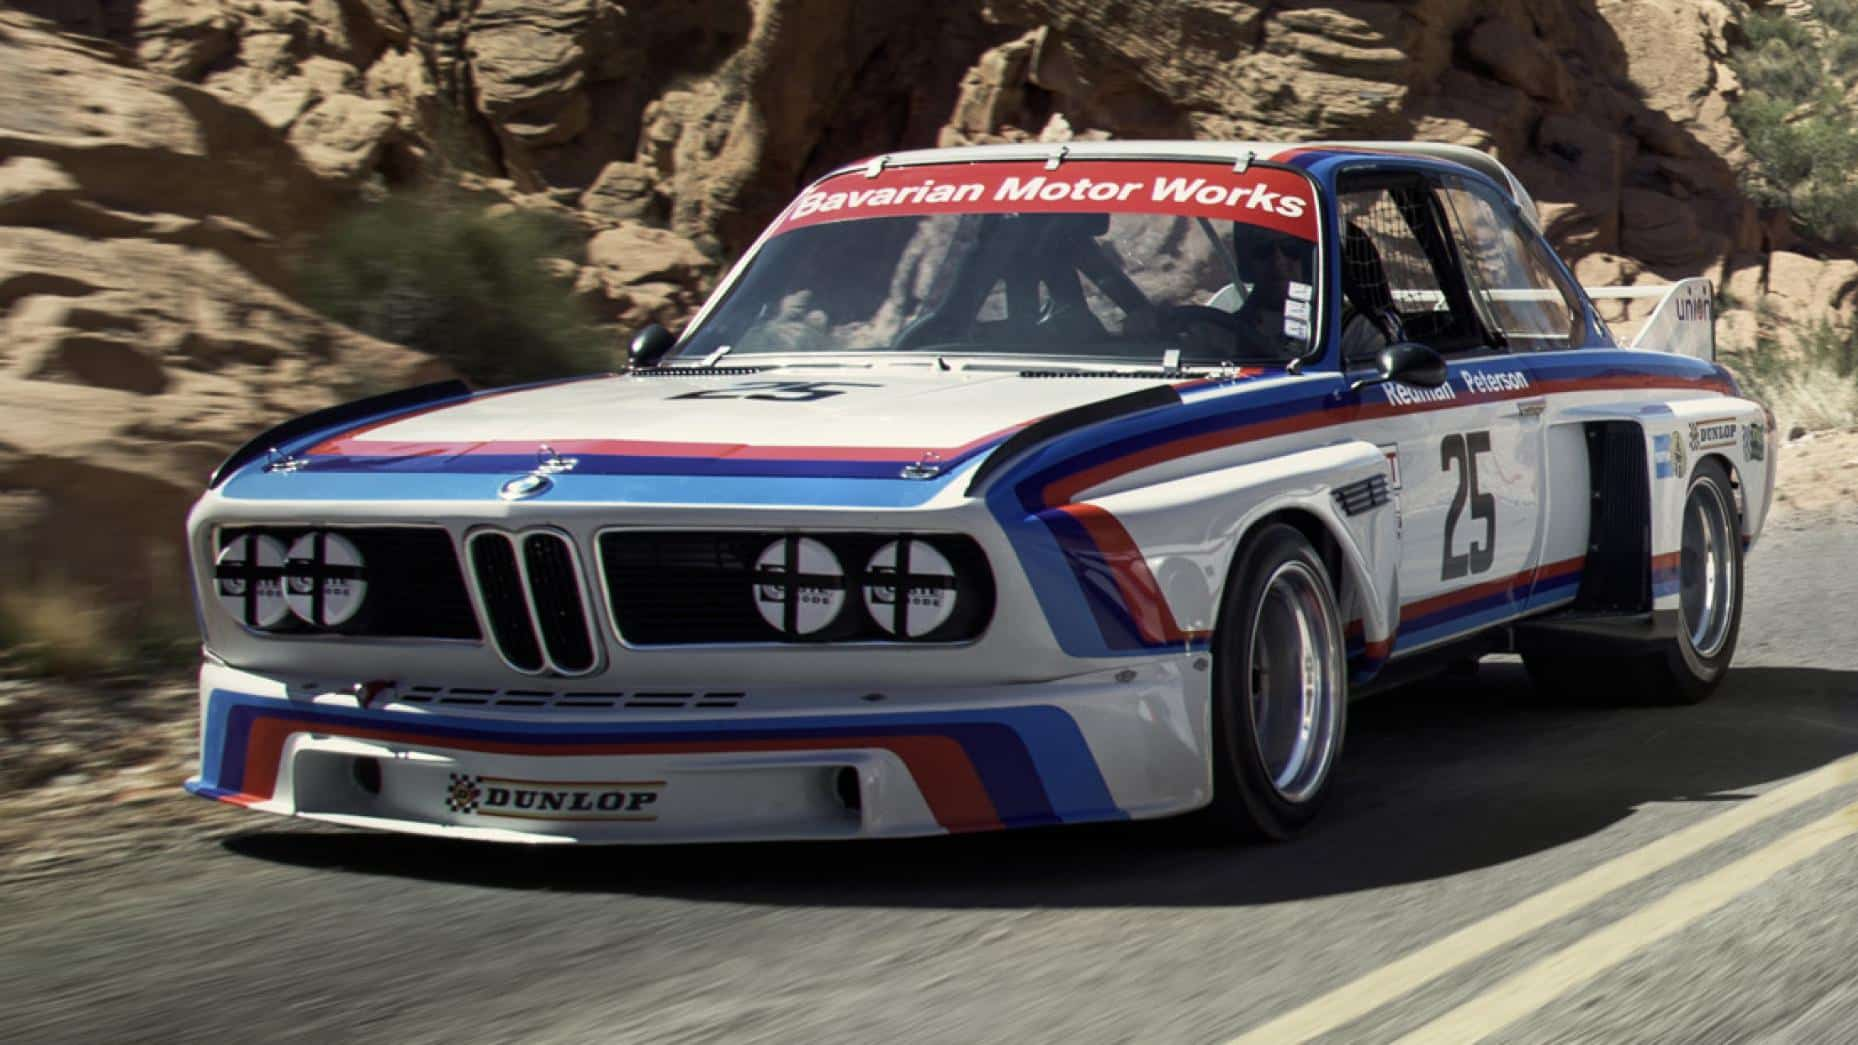 BMW CSL AKA BMW E CARLASSIC - 1975 bmw 3 0 csl